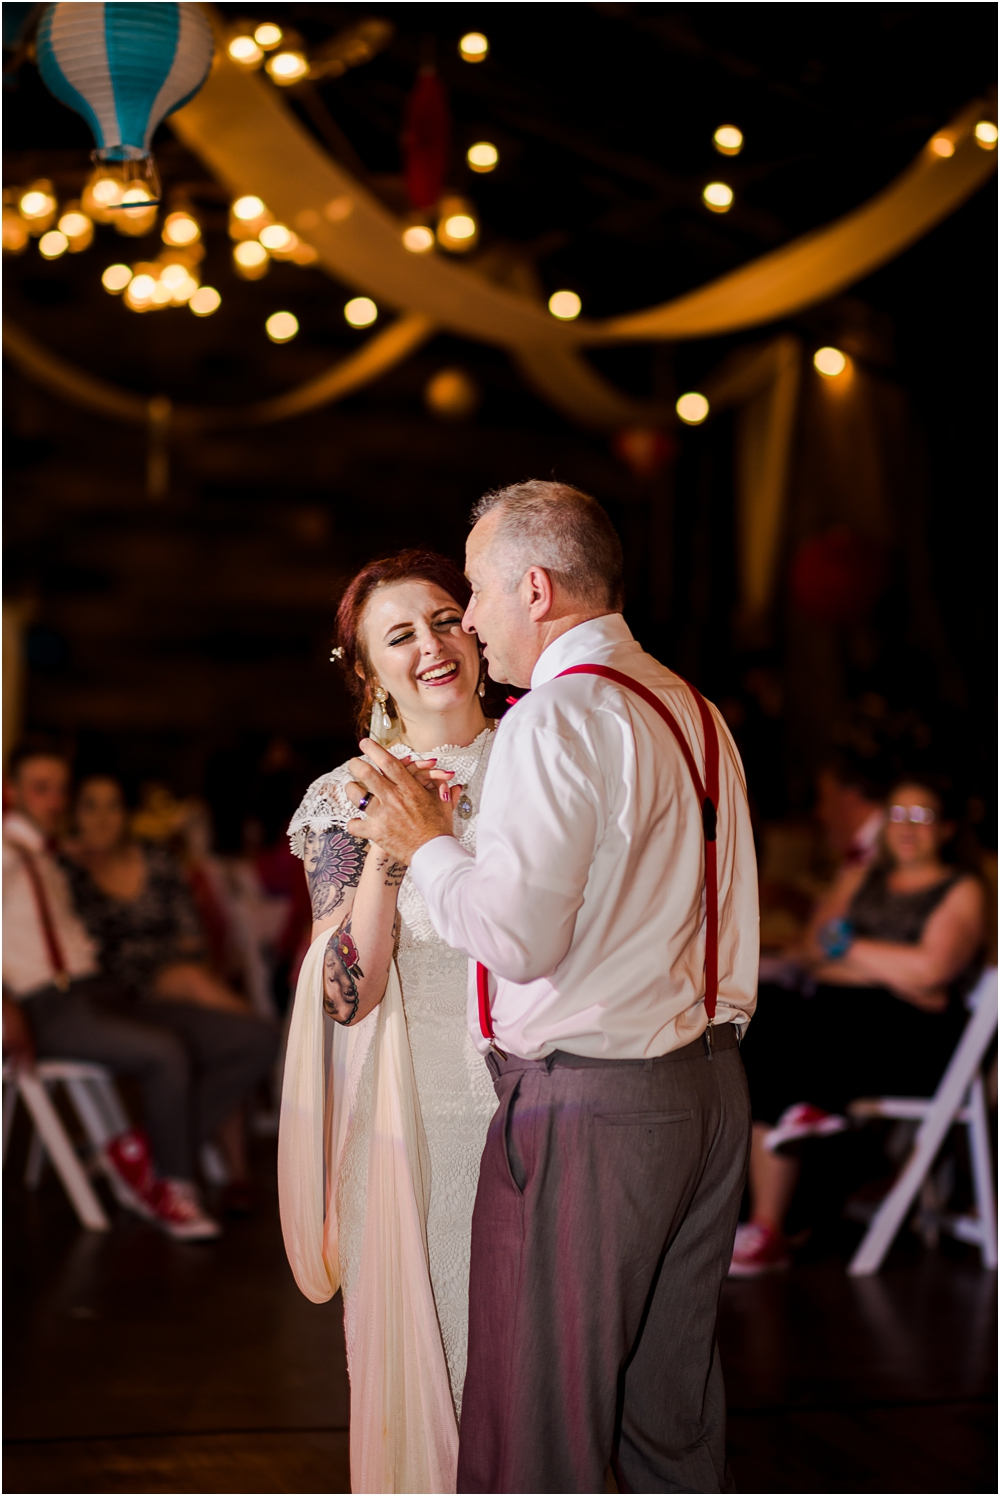 the-barn-at-wateroaks-circus-florida-wedding-photographer-kiersten-stevenson-photography-123.jpg